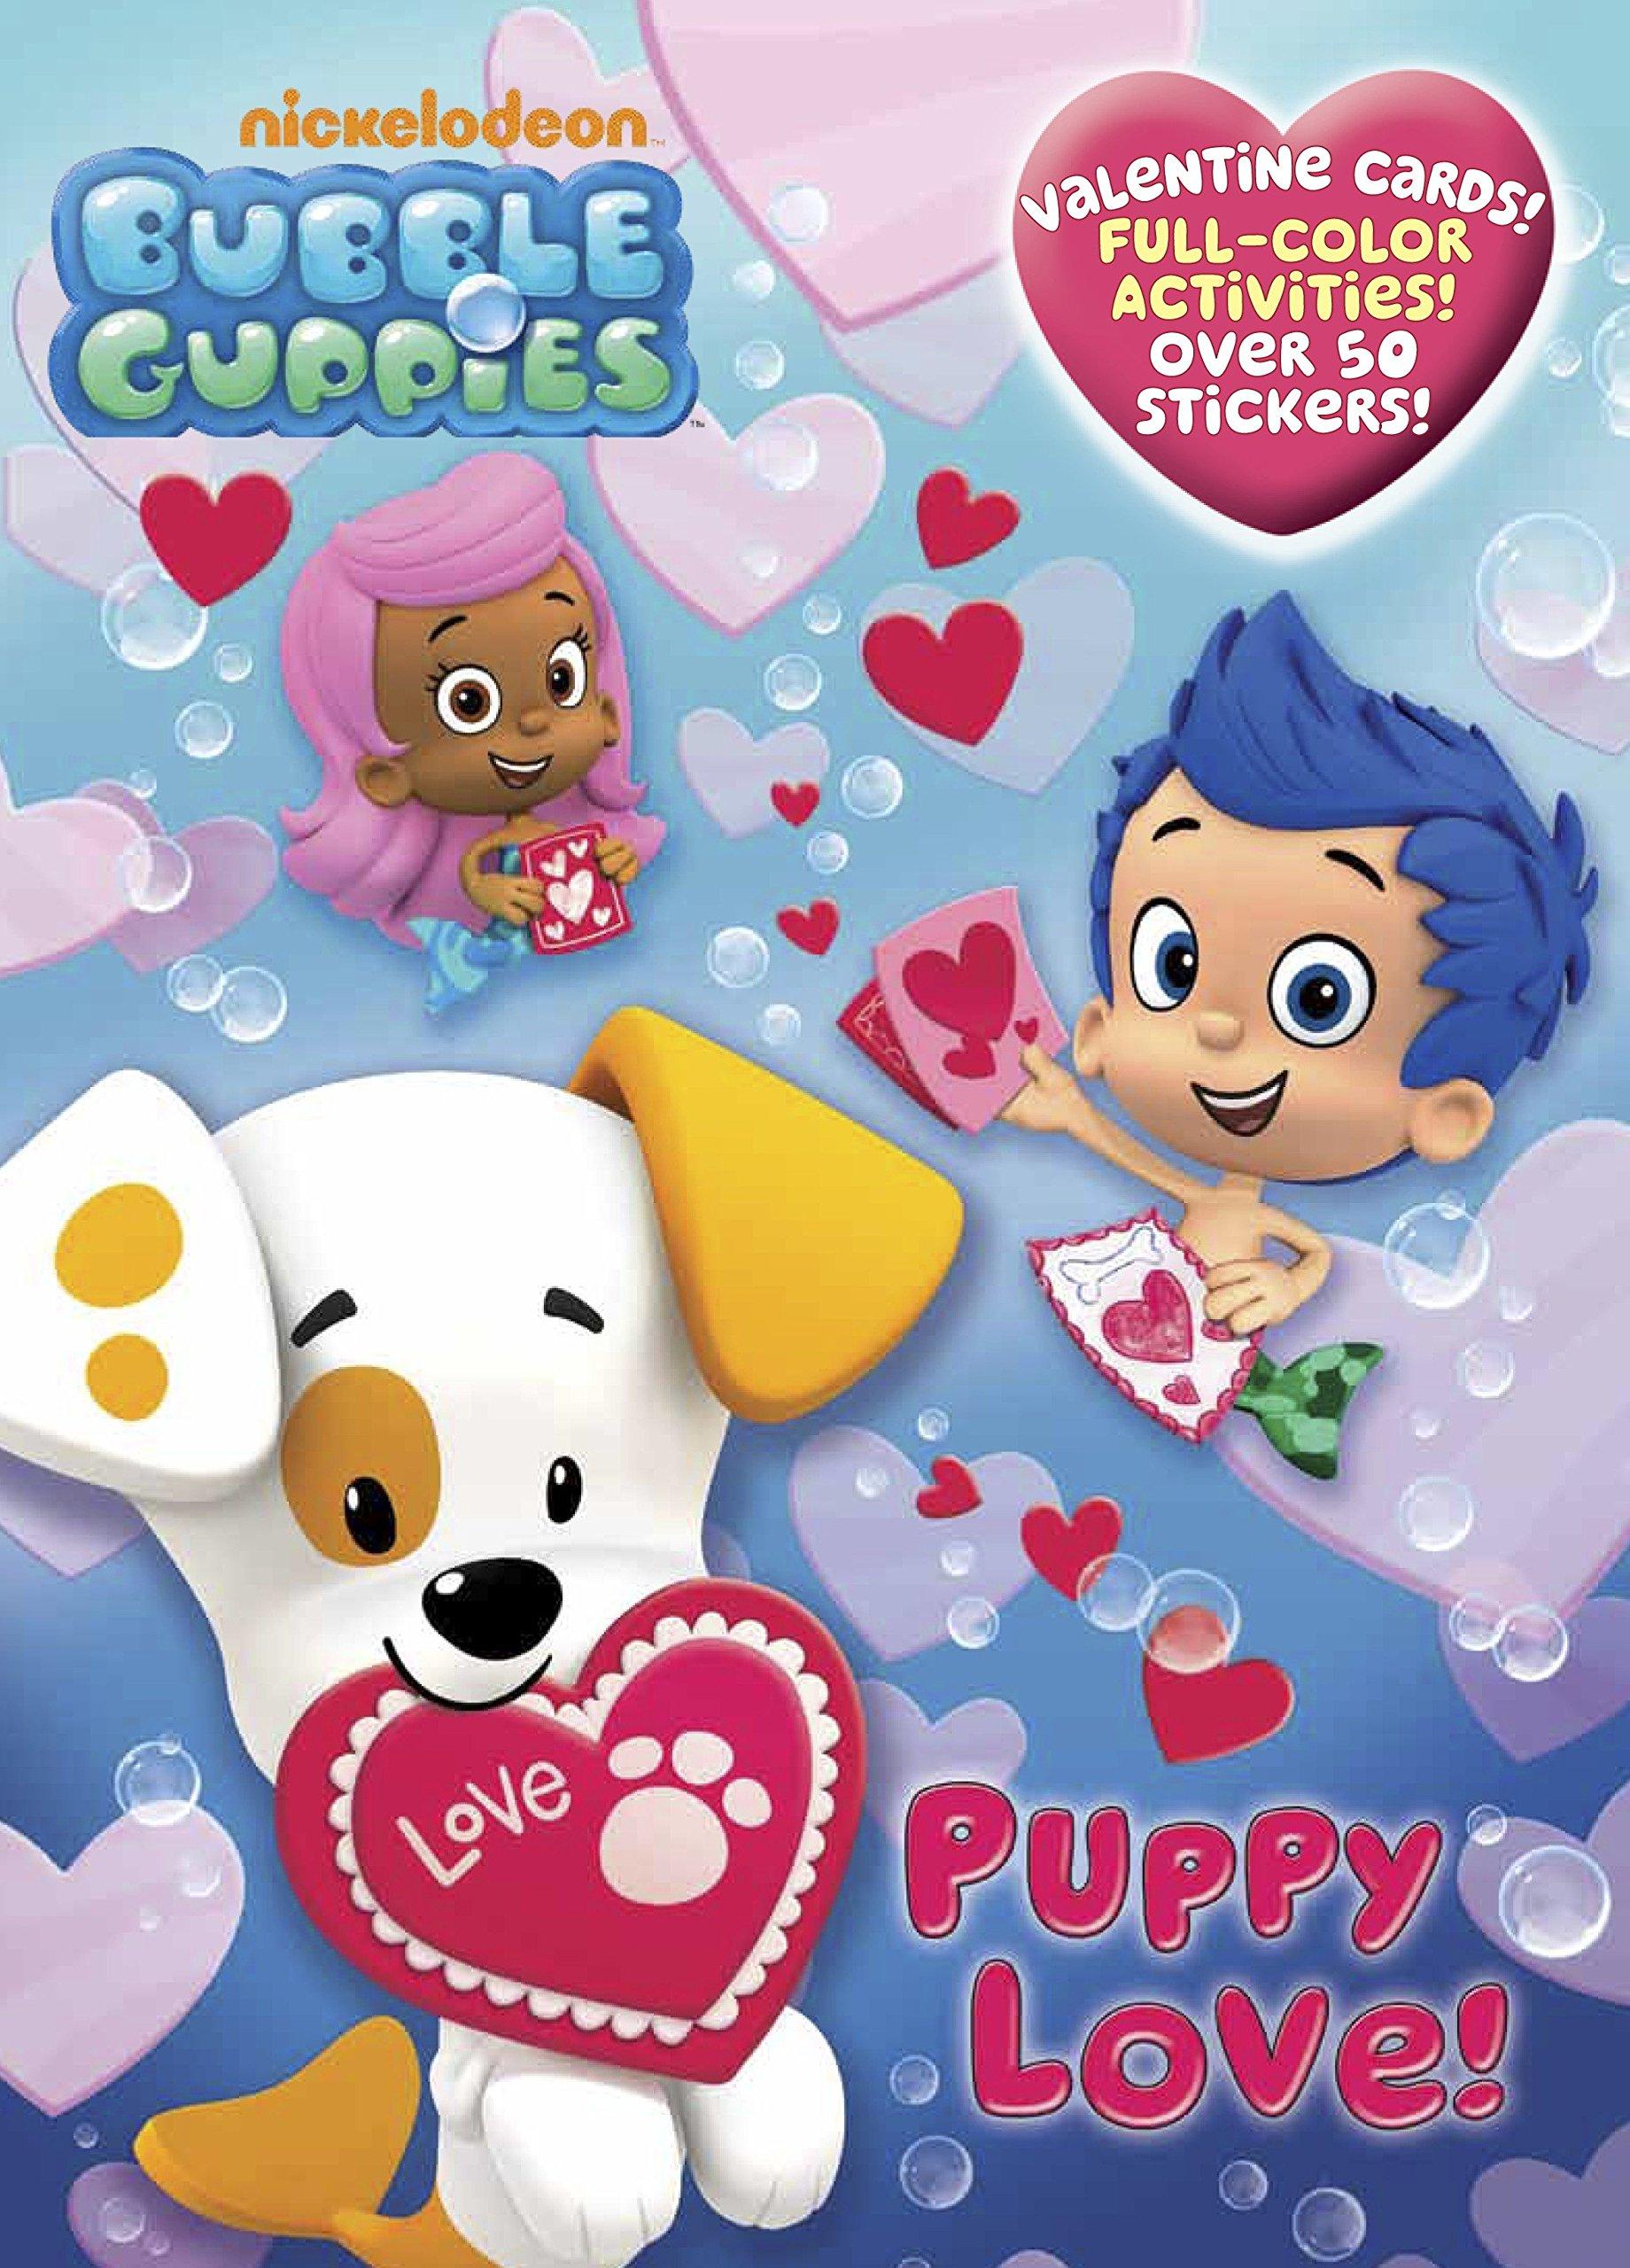 Bubble Guppies Puppy Love!